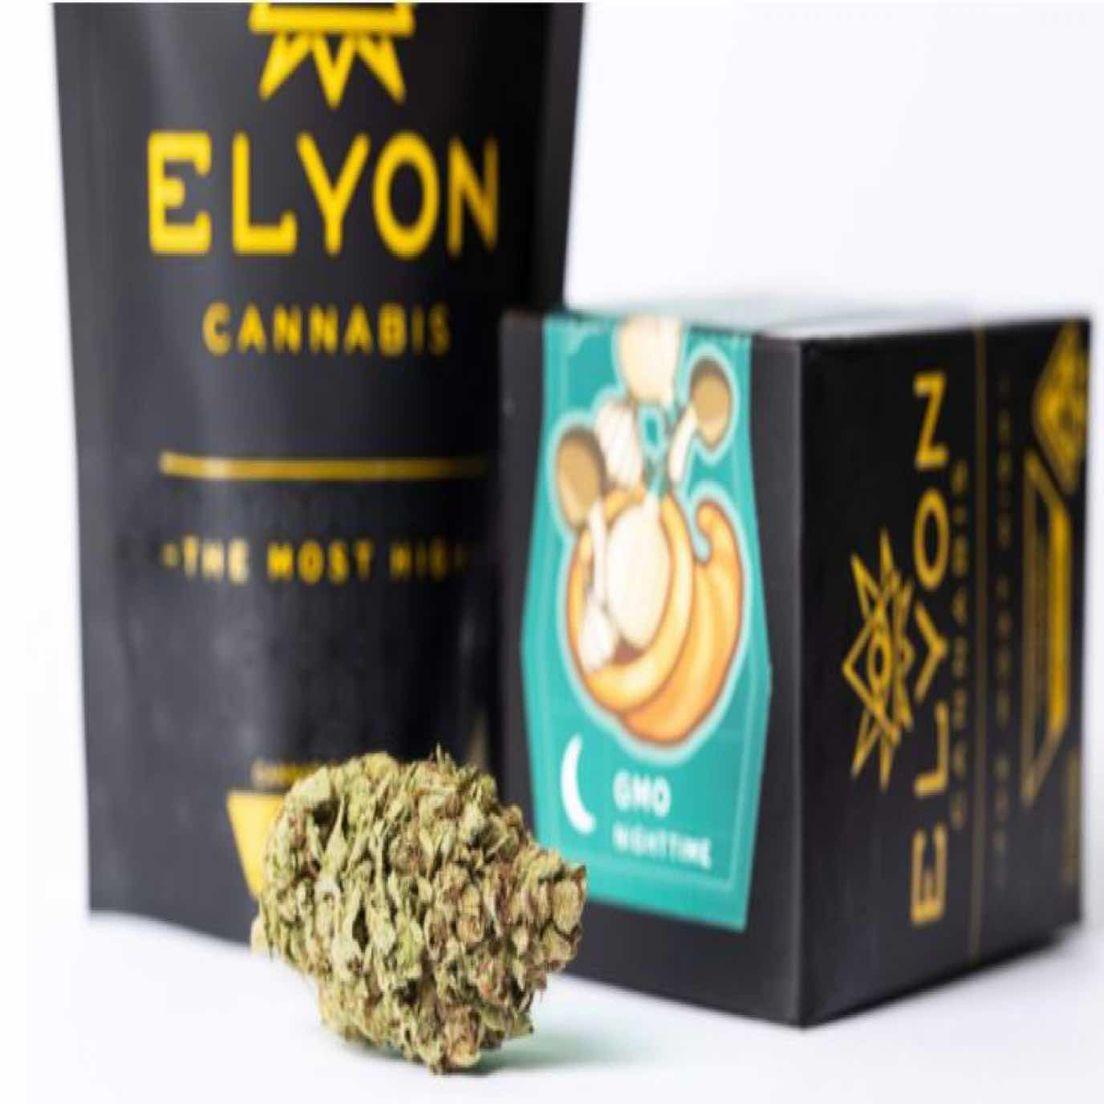 (PRE-ORDER ONLY) GMO - 3.5g (33% THC) Elyon